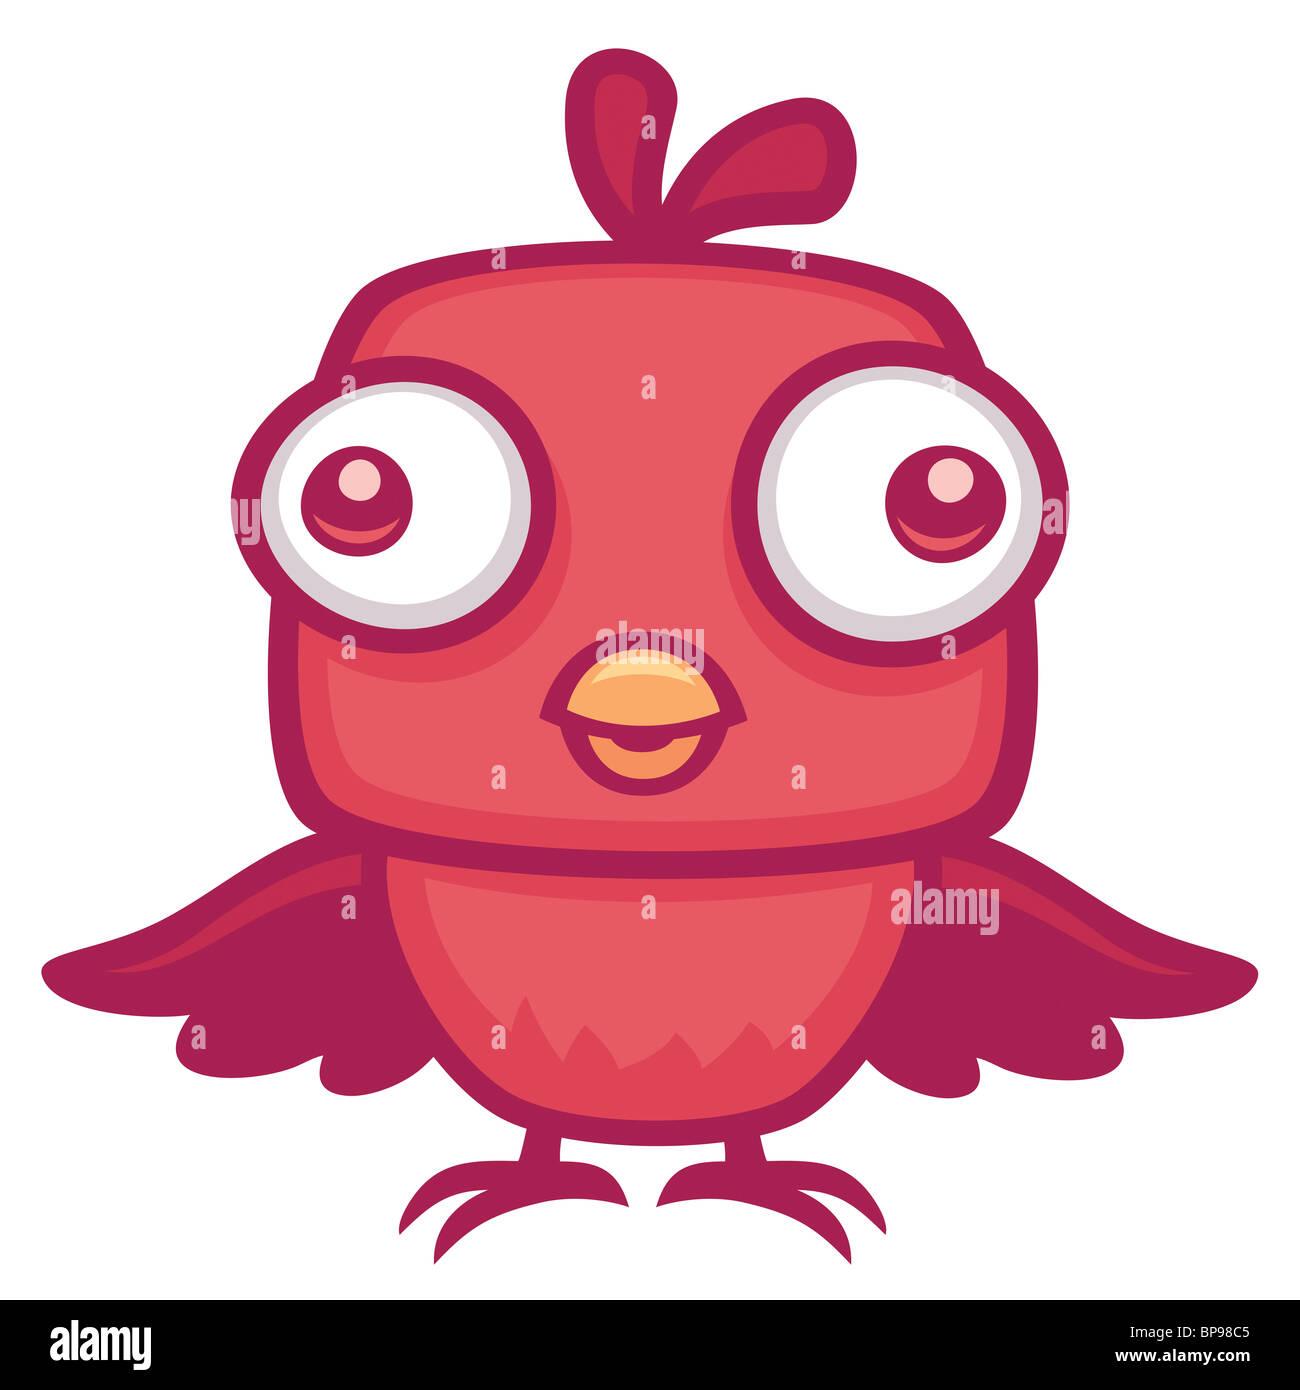 Cute Baby Bird - Stock Image